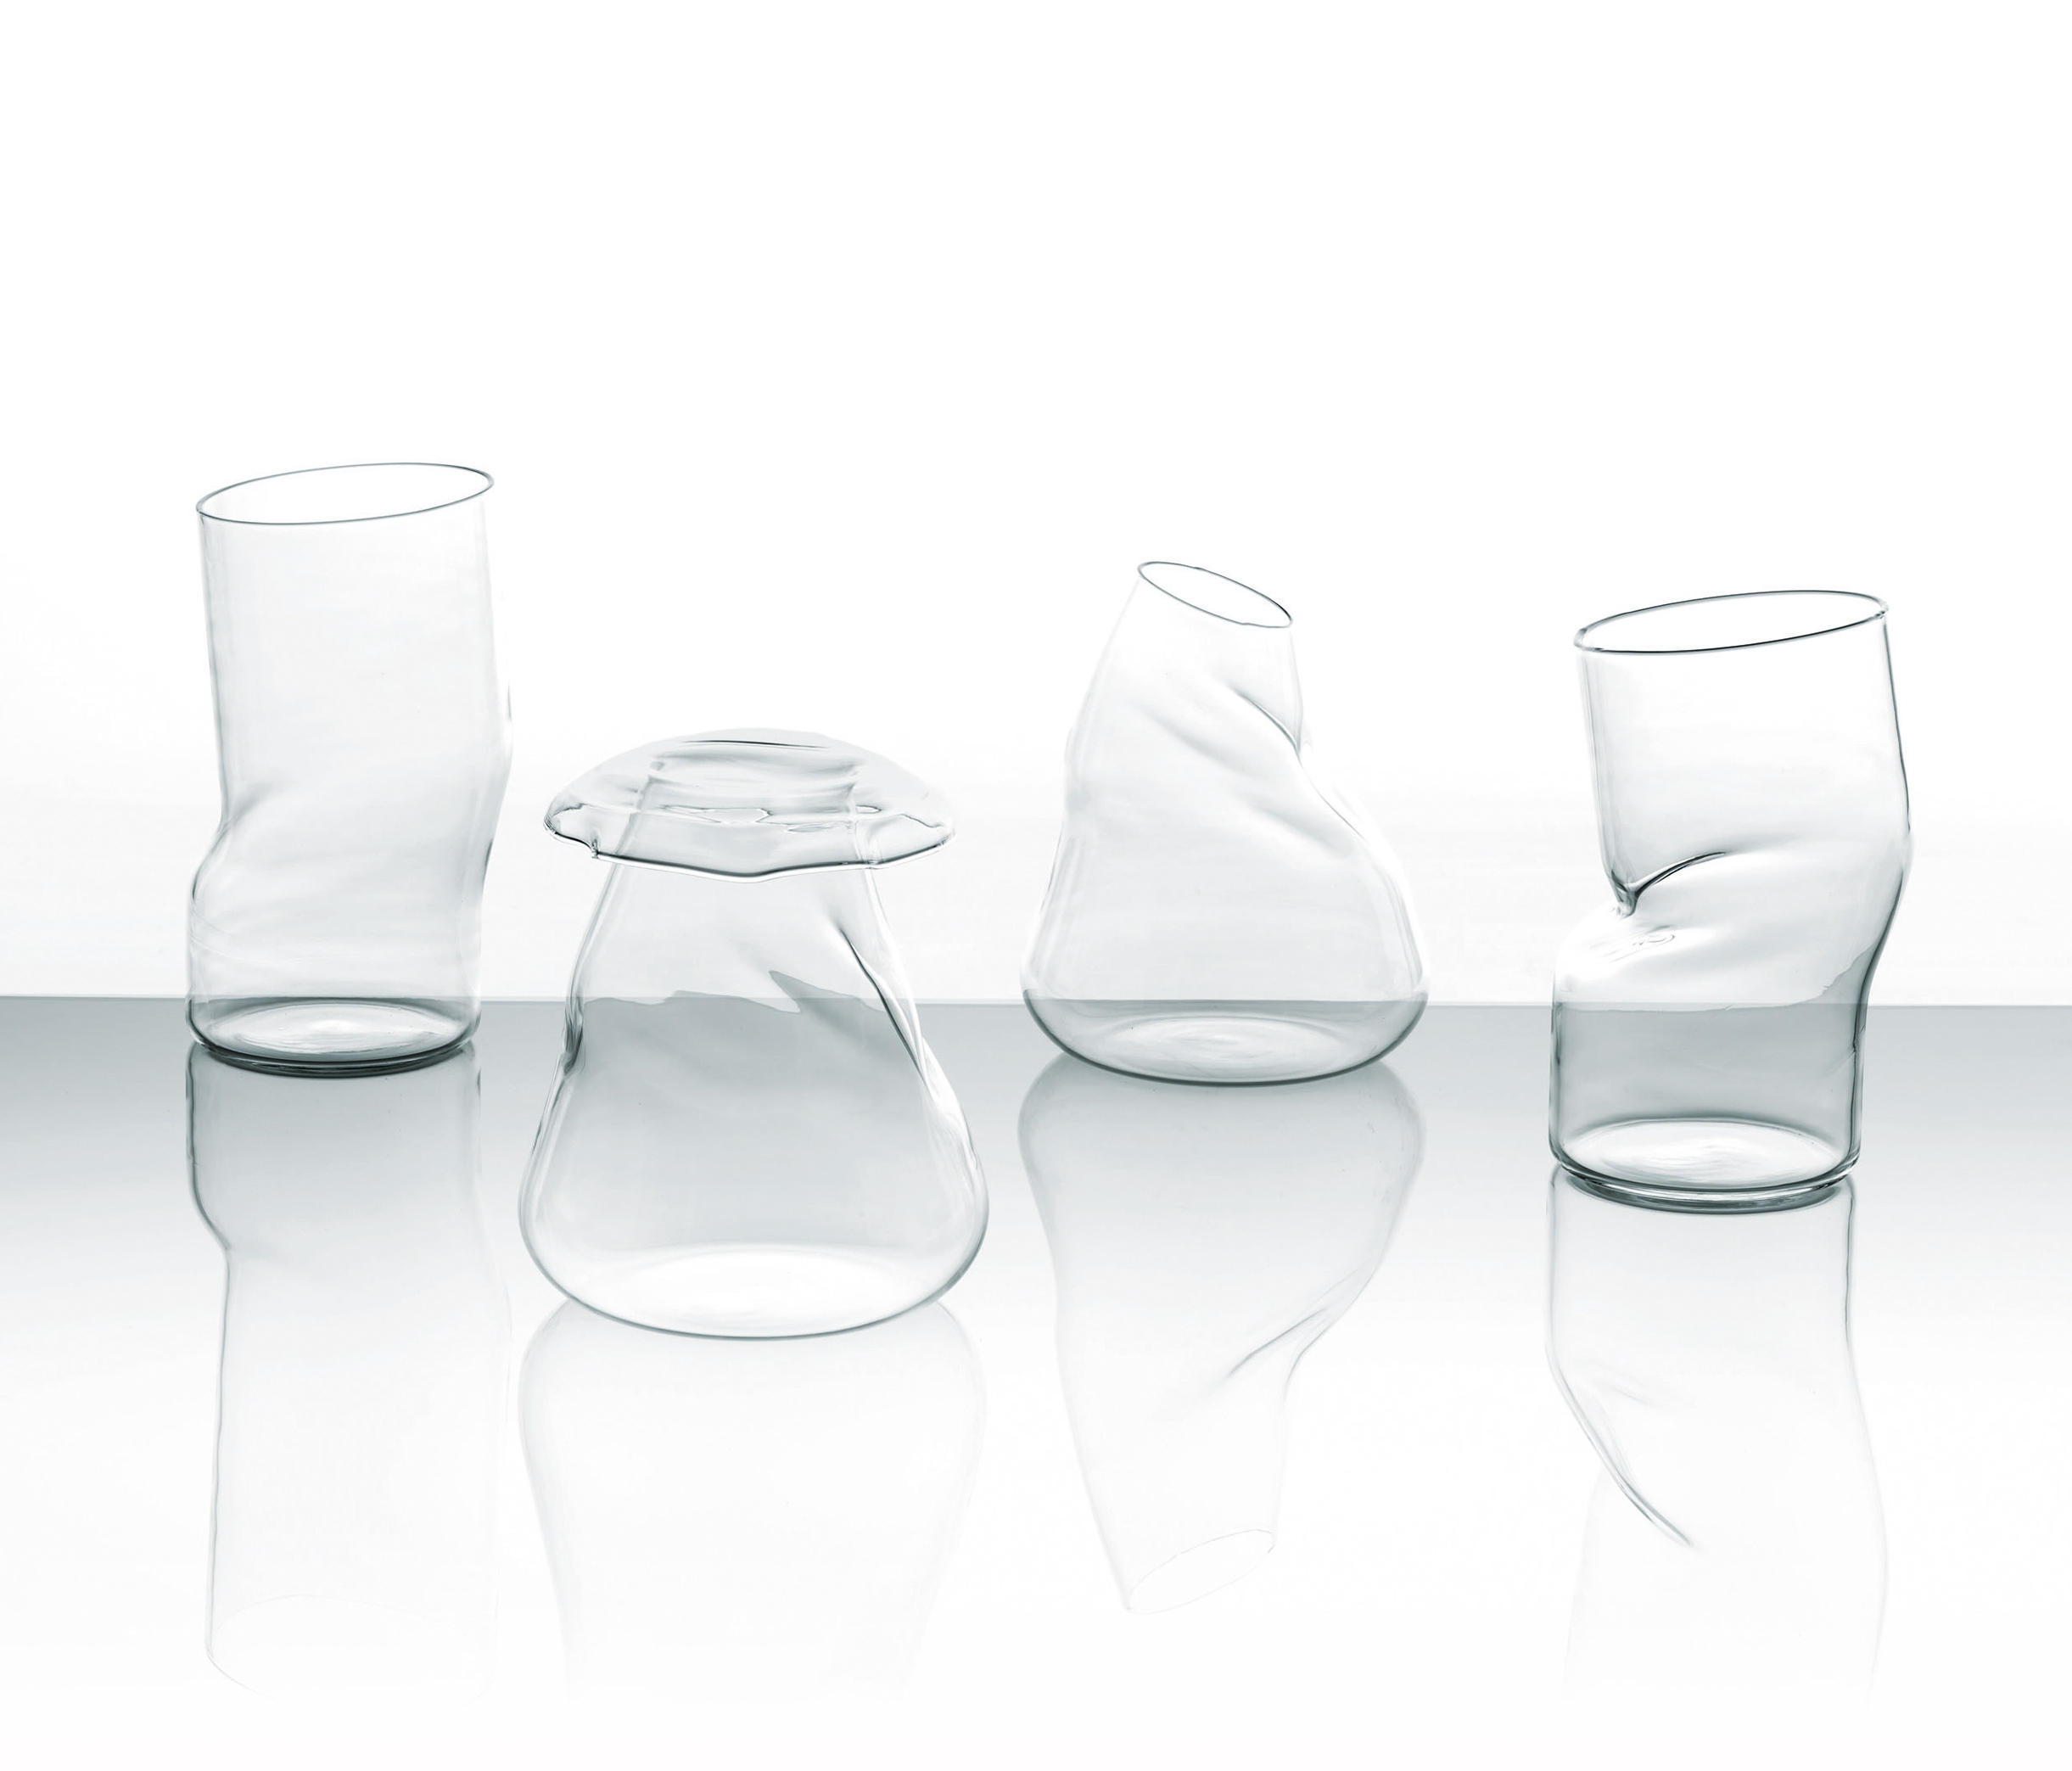 transformer vases from glas italia architonic. Black Bedroom Furniture Sets. Home Design Ideas